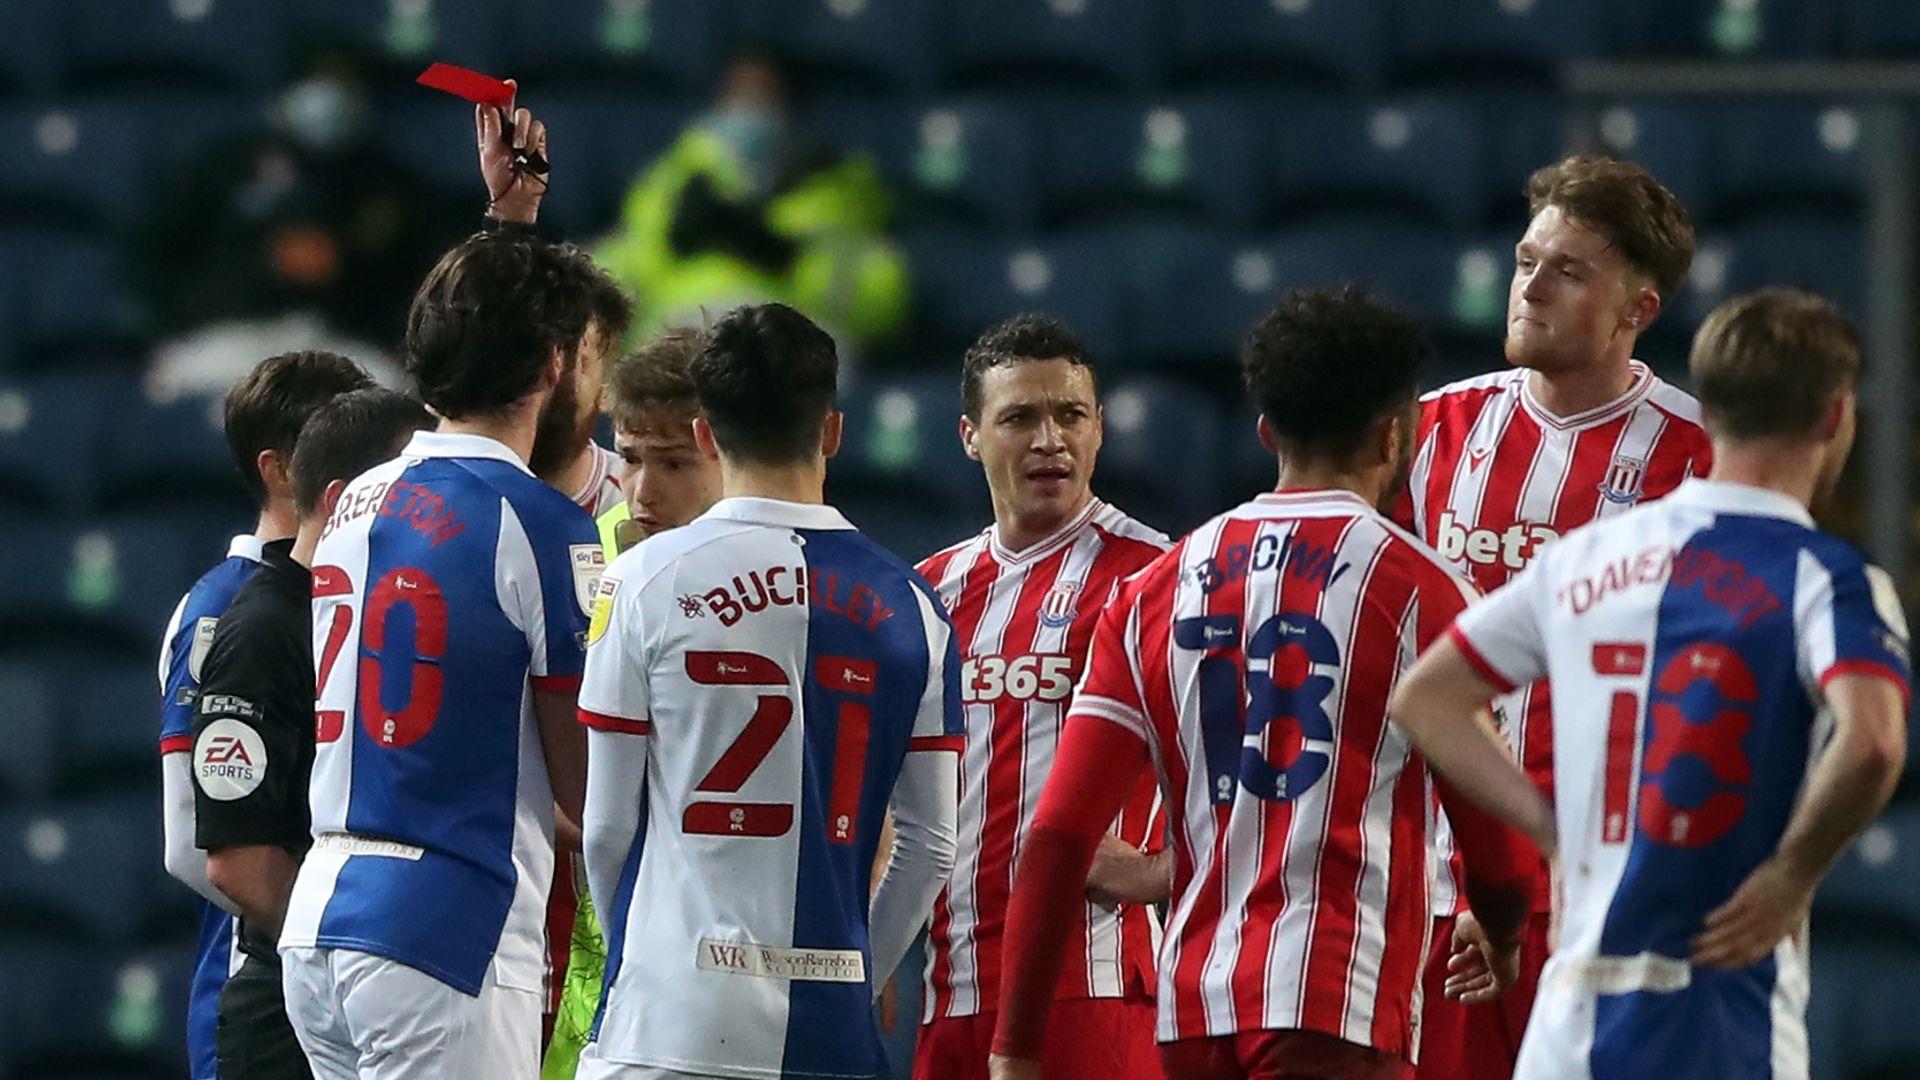 Blackburn strike back to hold Stoke